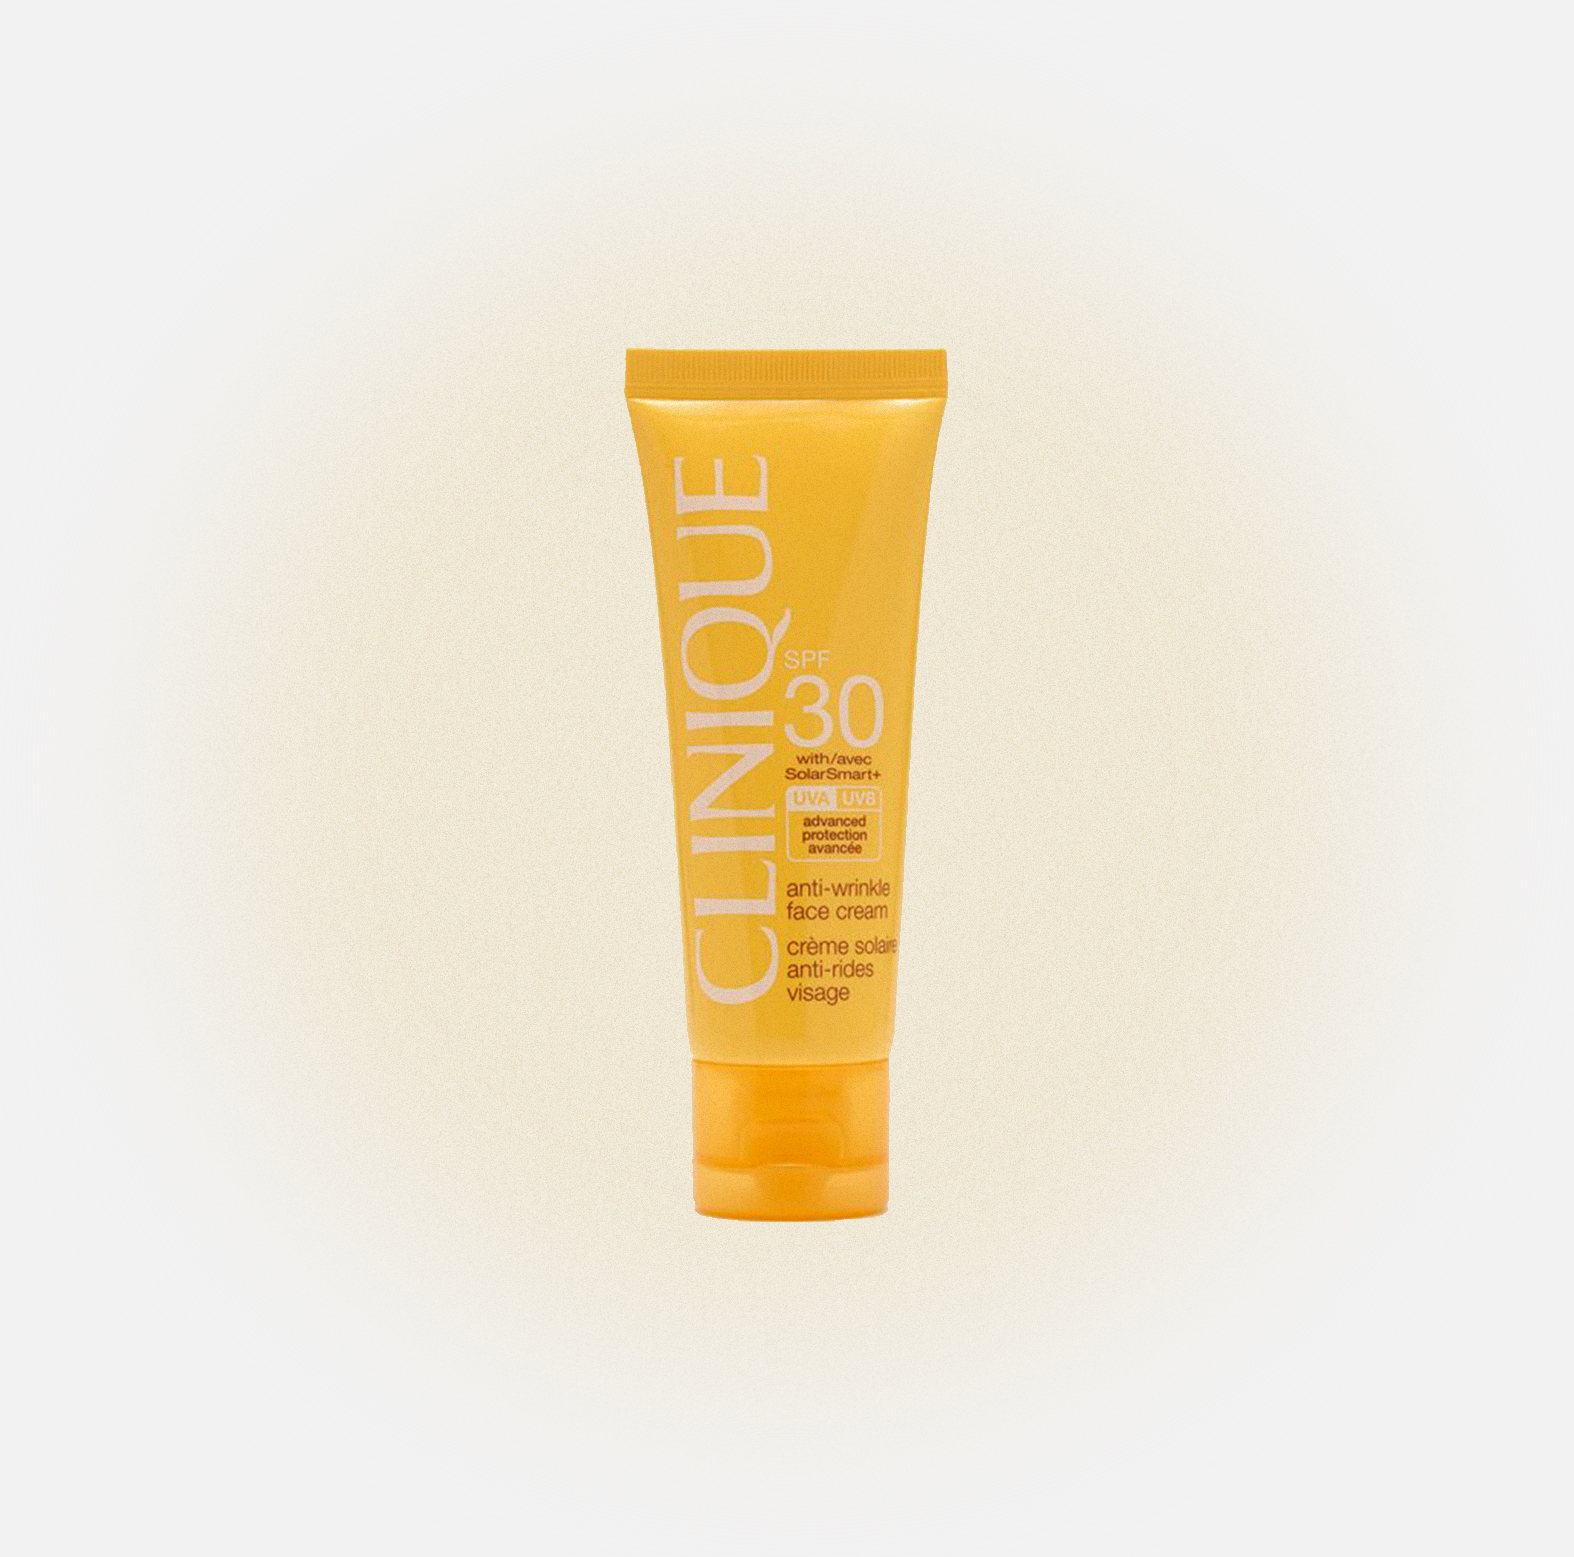 Солнцезащитный крем для лица Face Cream Hybrid SPF 30, Clinique